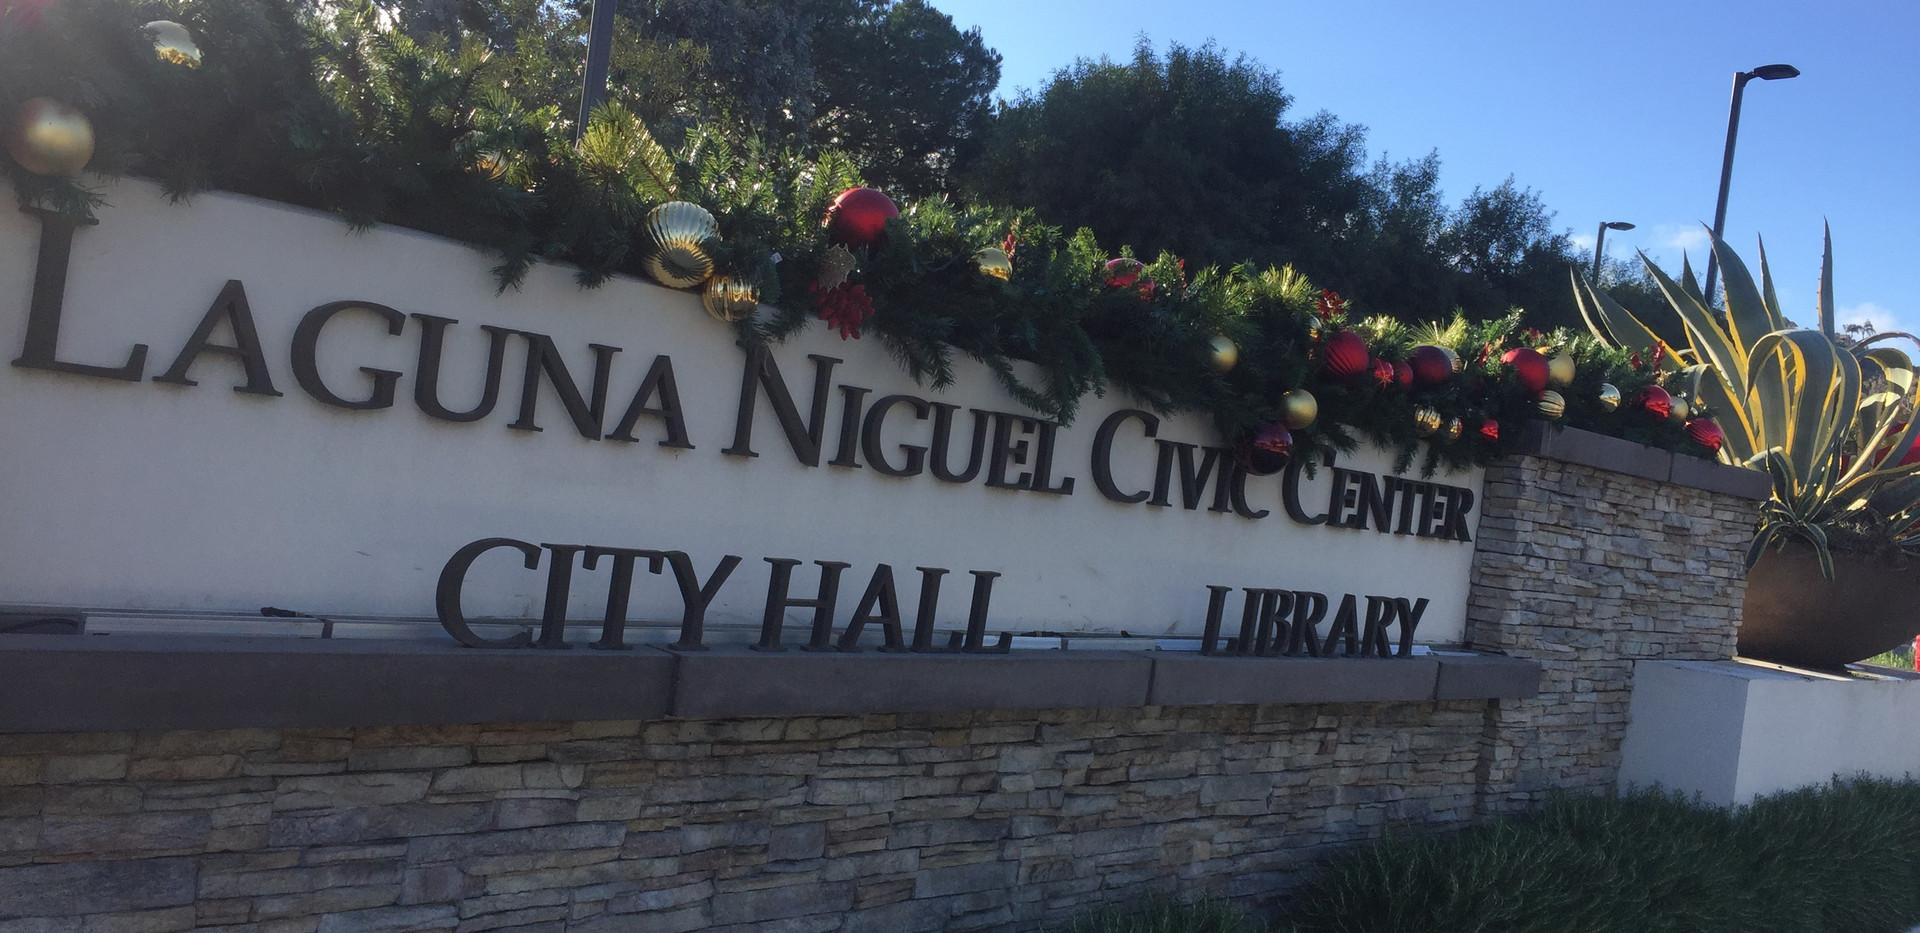 City of Laguna Niguel 3.jpg